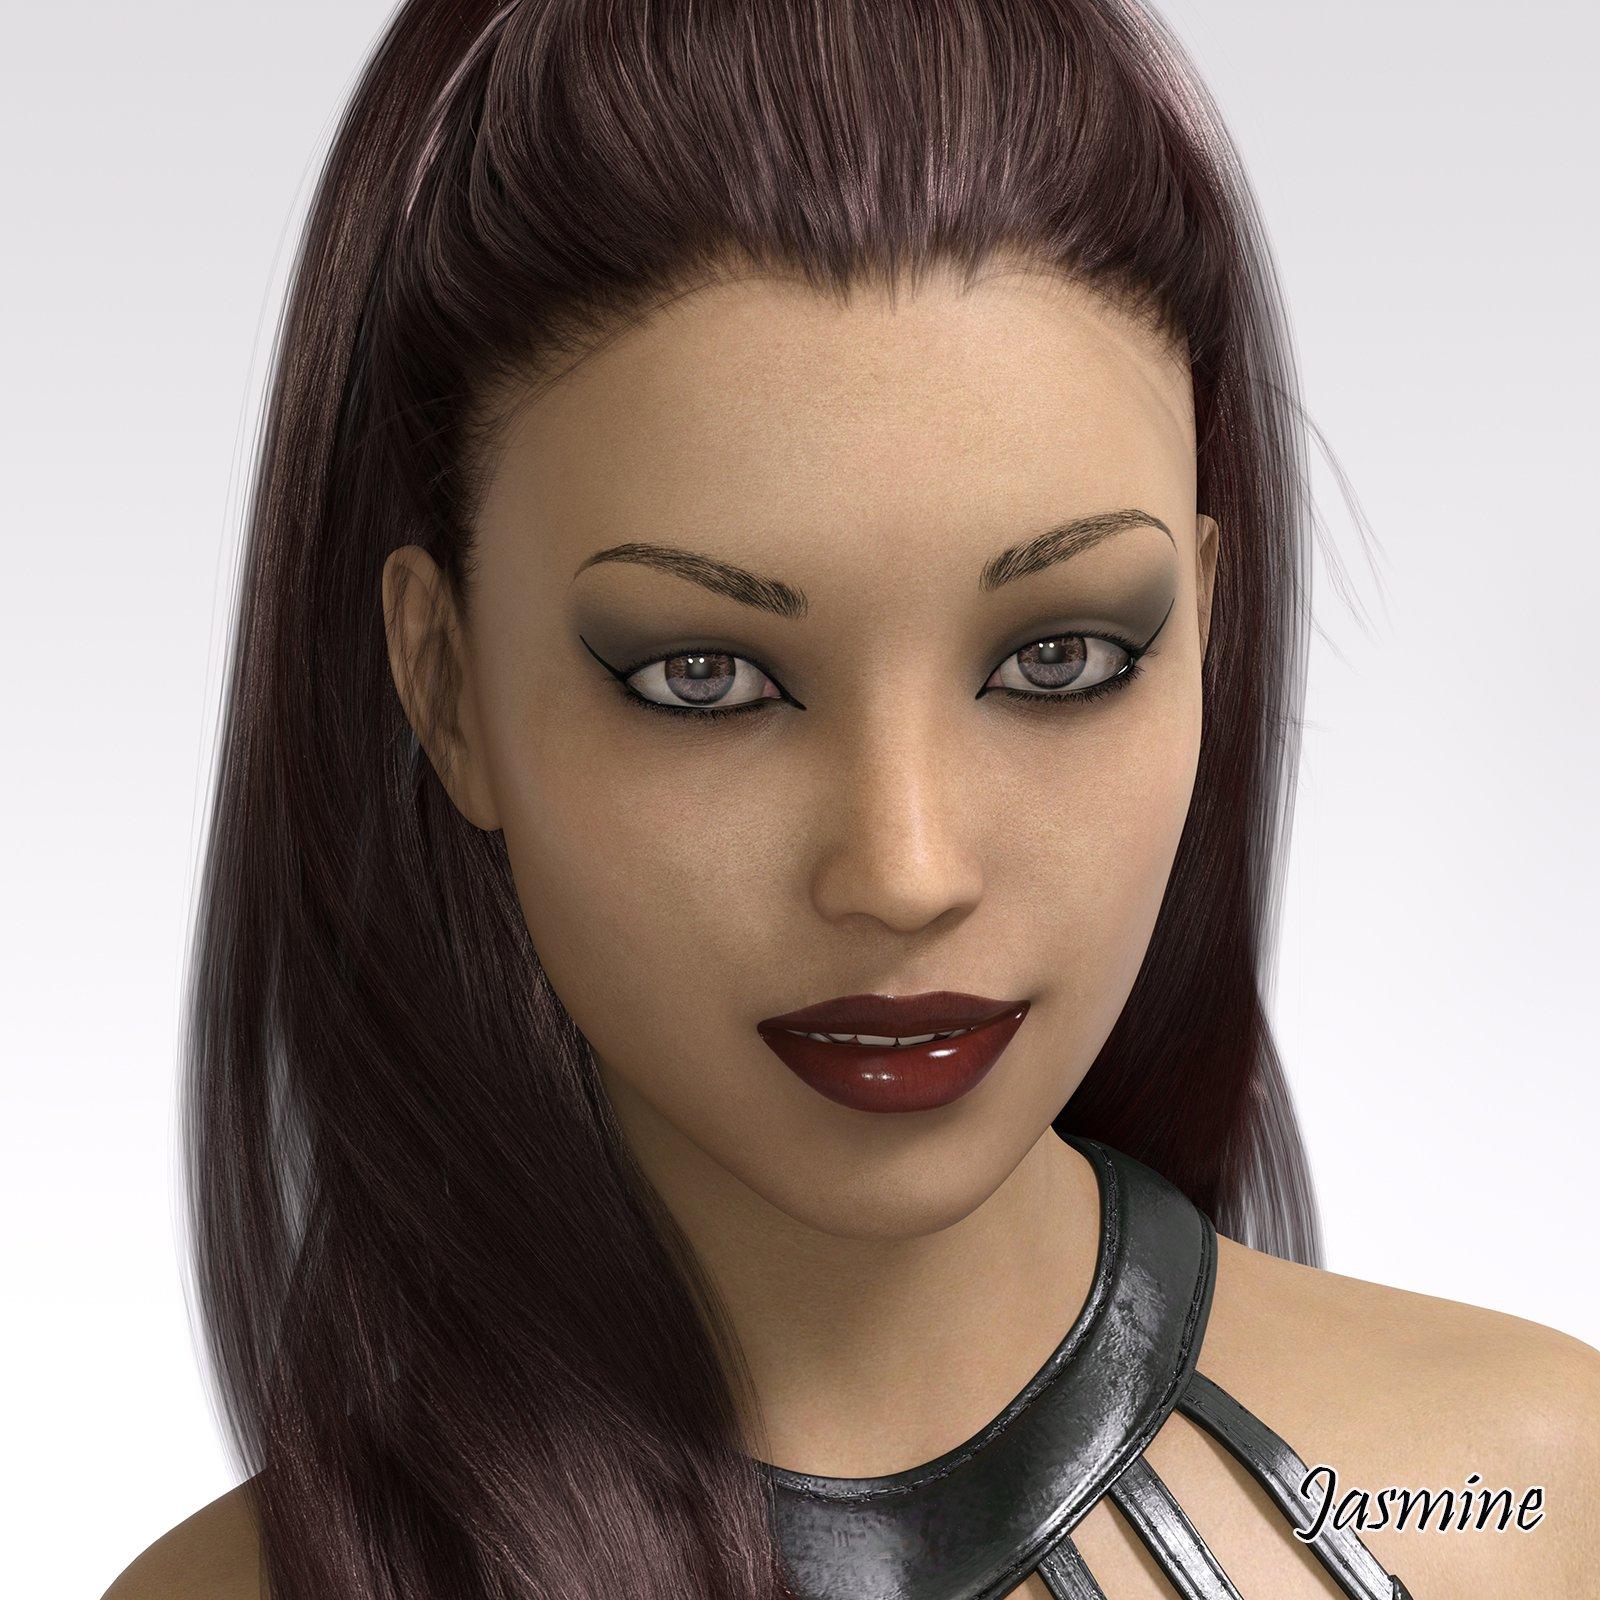 uc_art Jasmine G8F Character_DAZ3D下载站